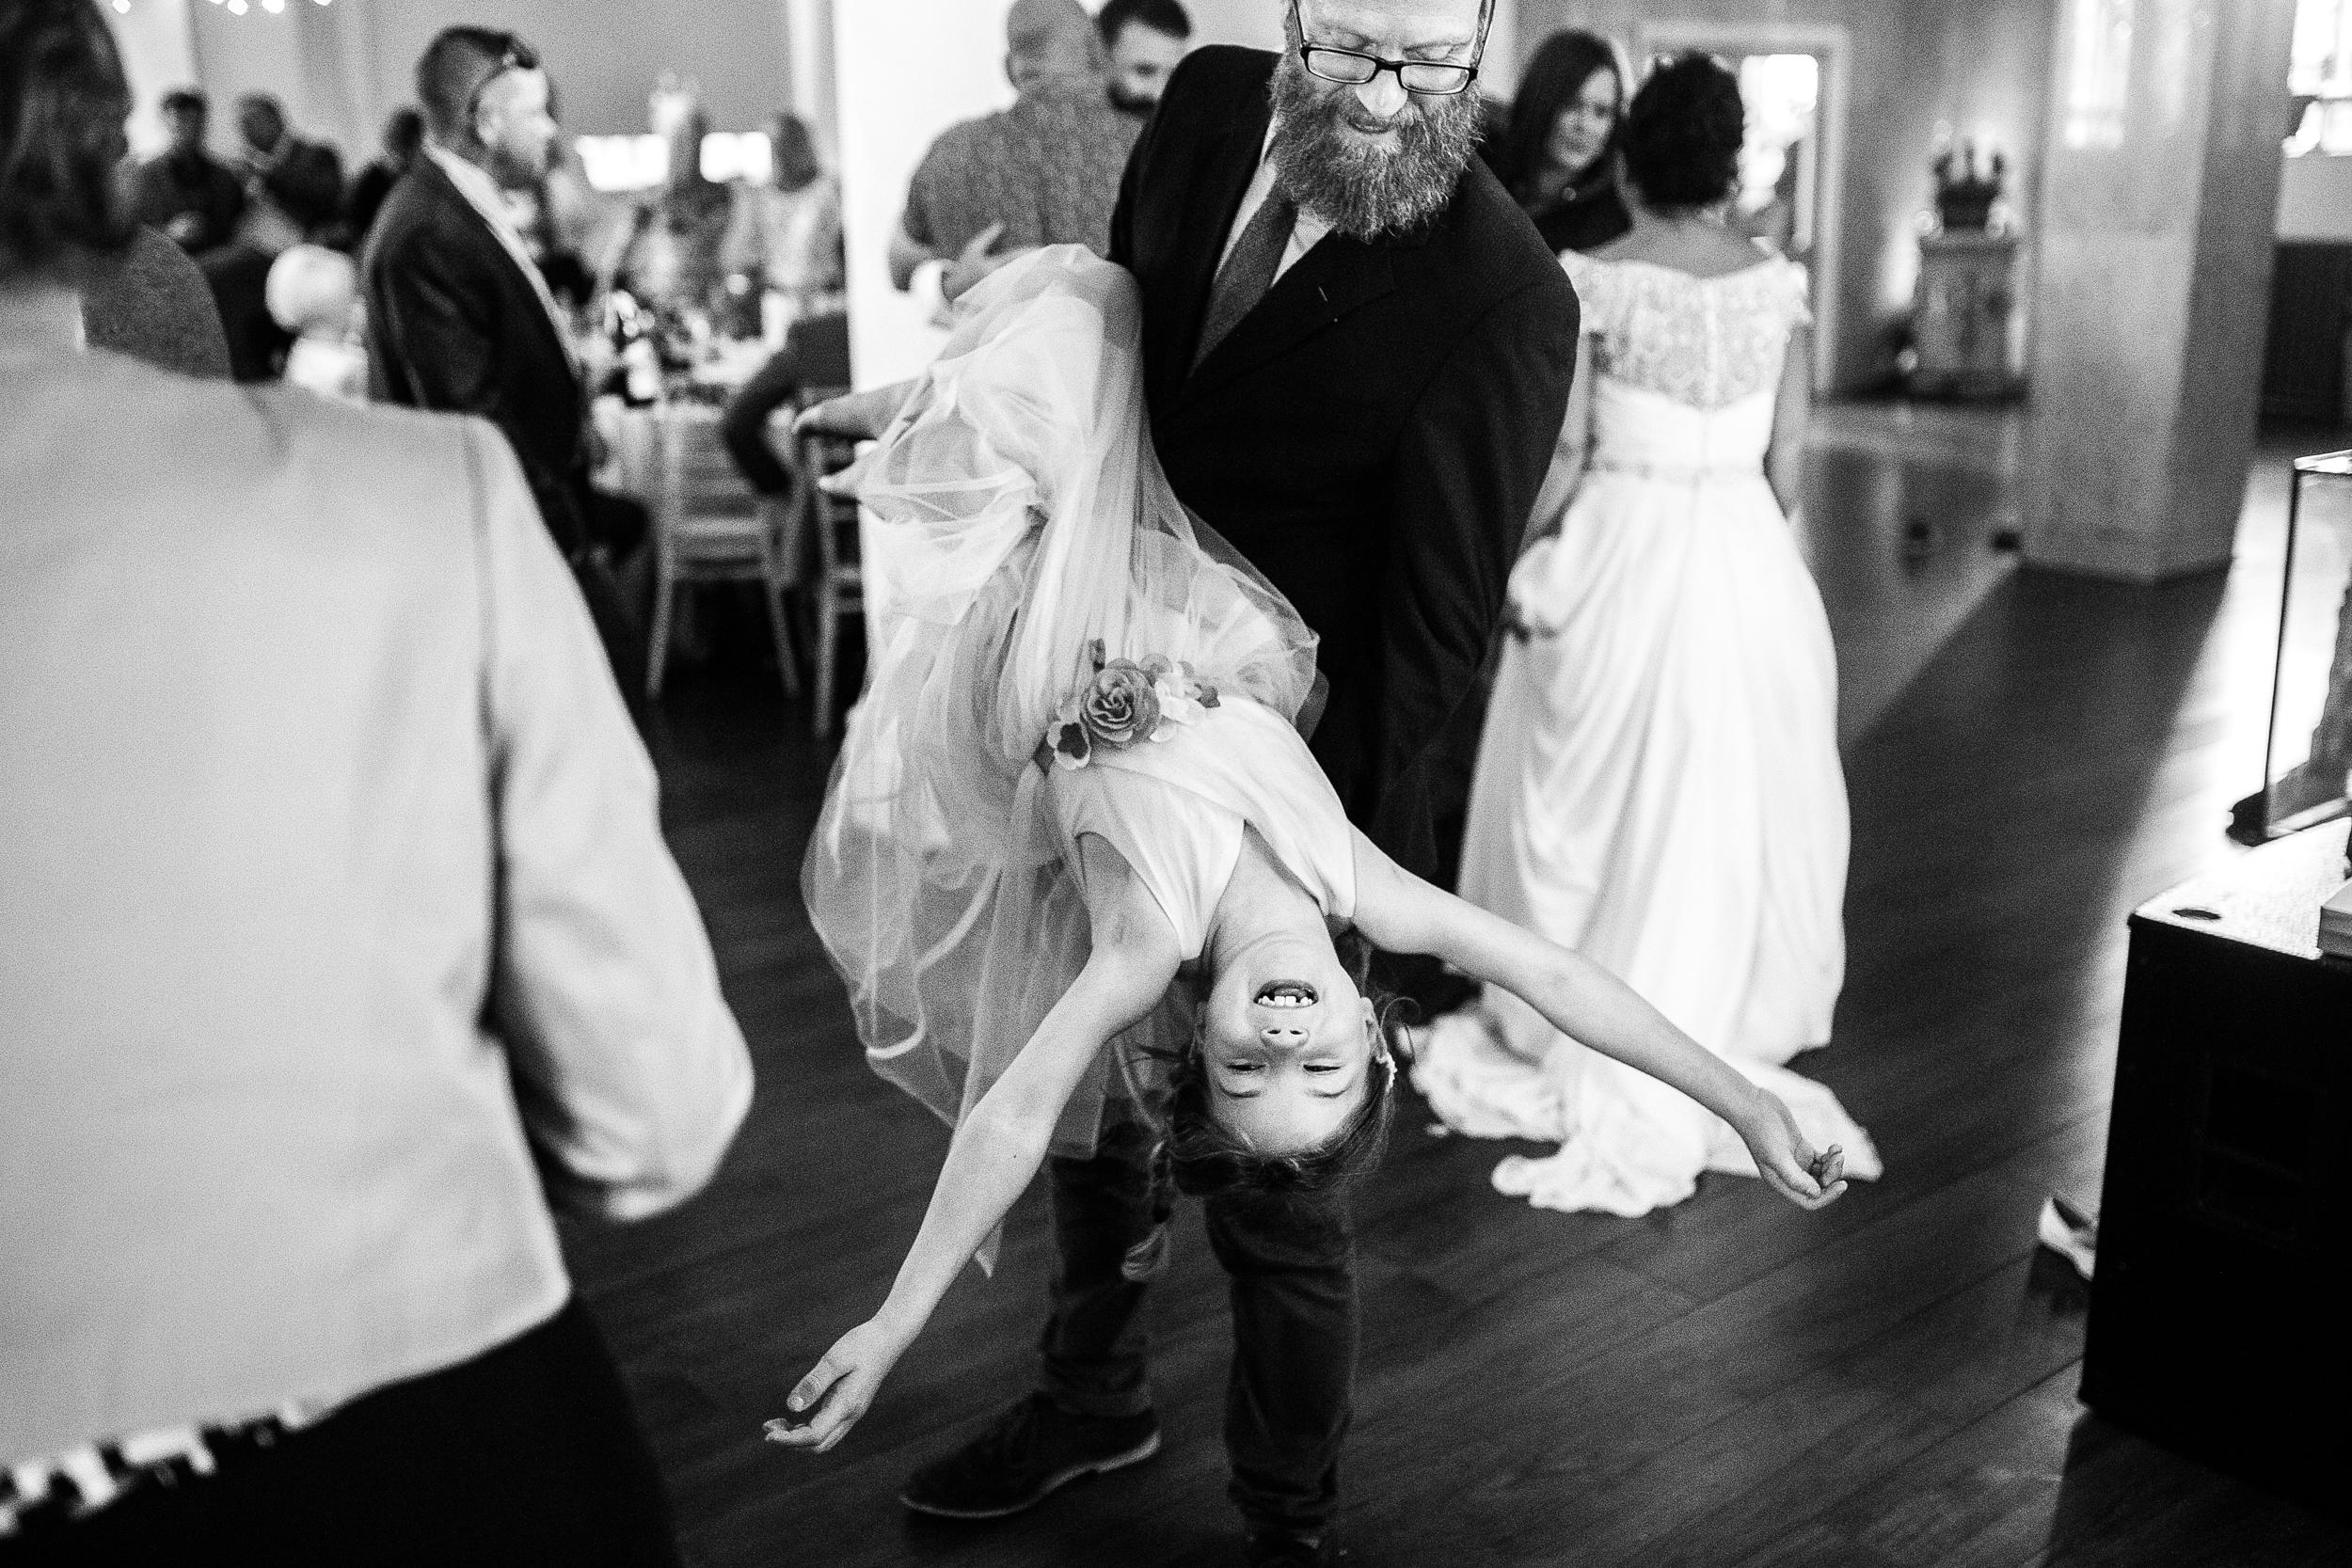 creative-wedding-photography-teesside-north-east-yorkshire-10.jpg